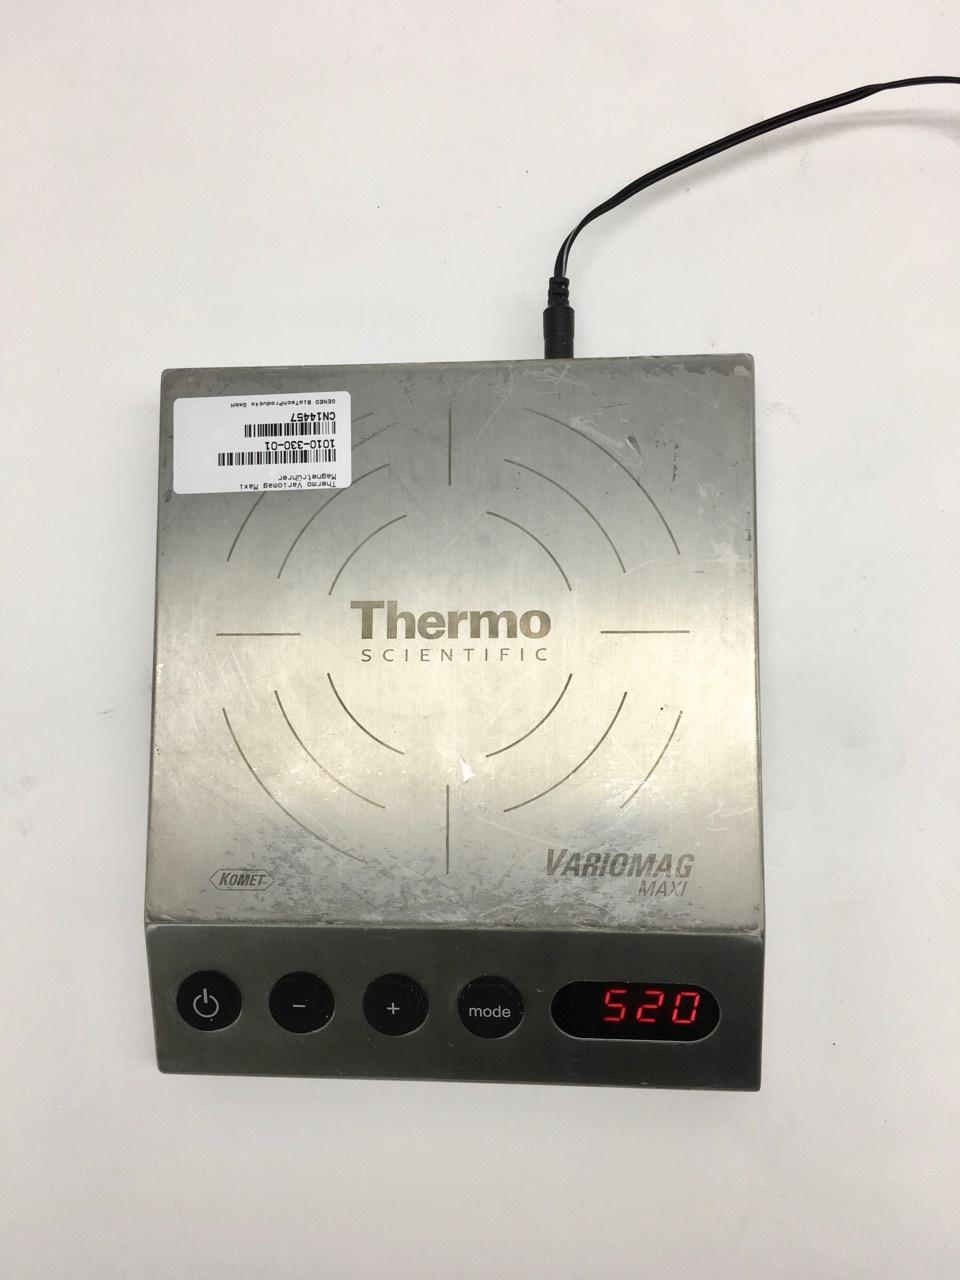 Thermo Scientific Thermo Variomag Maxi magnetic stirrer